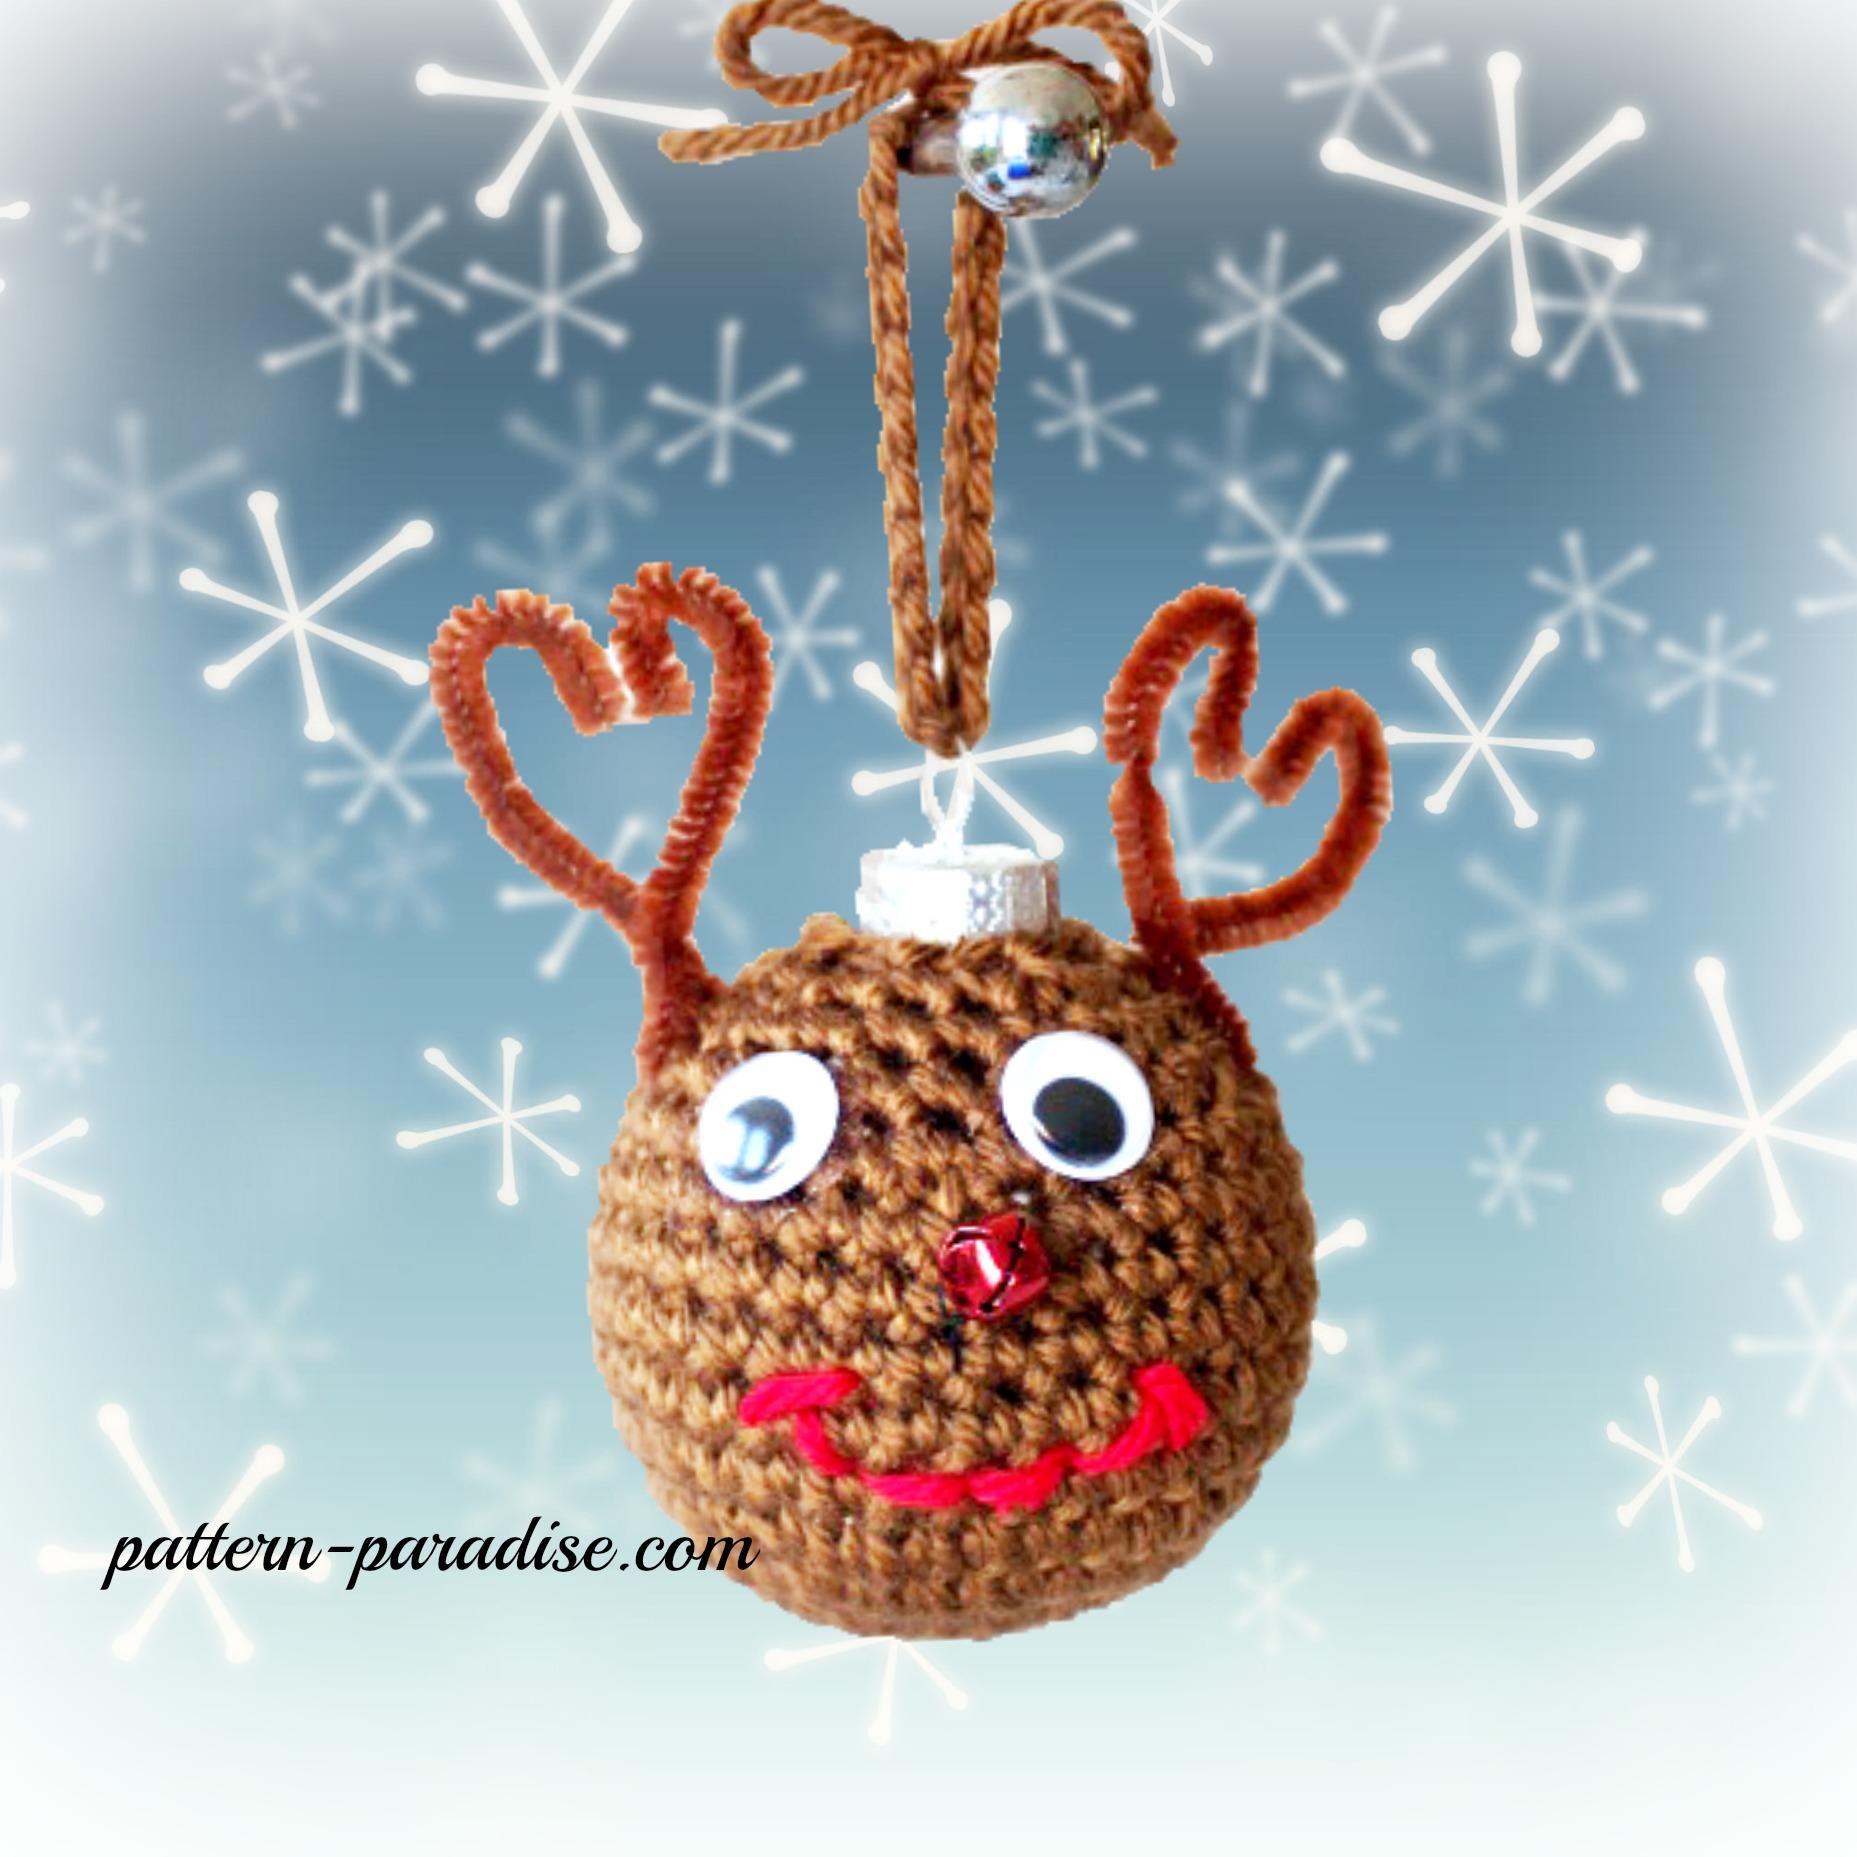 Free crochet pattern christmas tree ornaments pattern paradise reindeer crochet christmas tree ornaments by pattern paradise bankloansurffo Choice Image